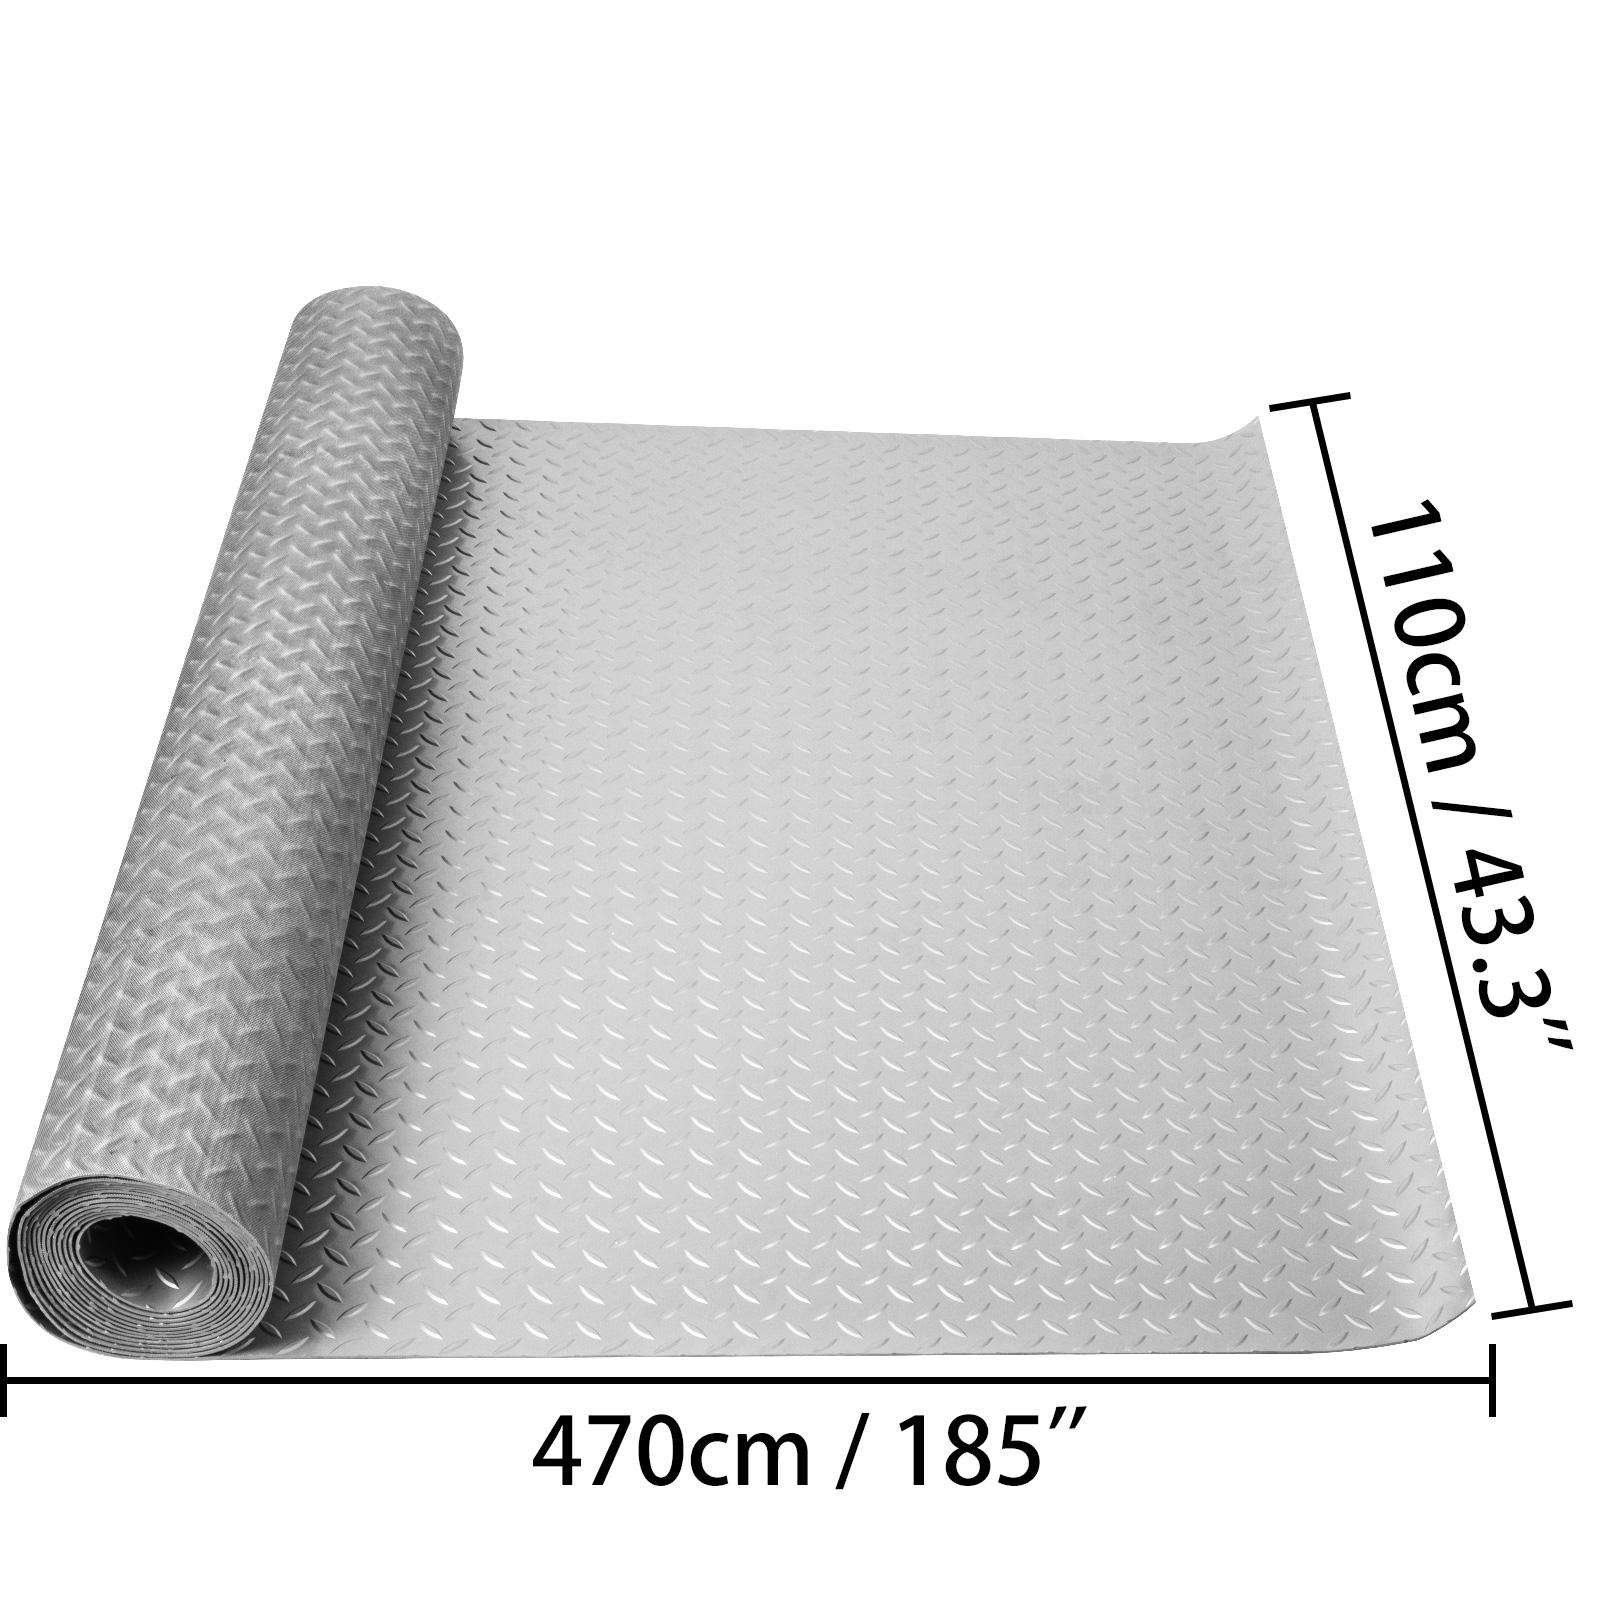 thumbnail 44 - Garage Flooring Mat Roll Car Trailer Floor Covering 1.1m Width Gym Floor Roll